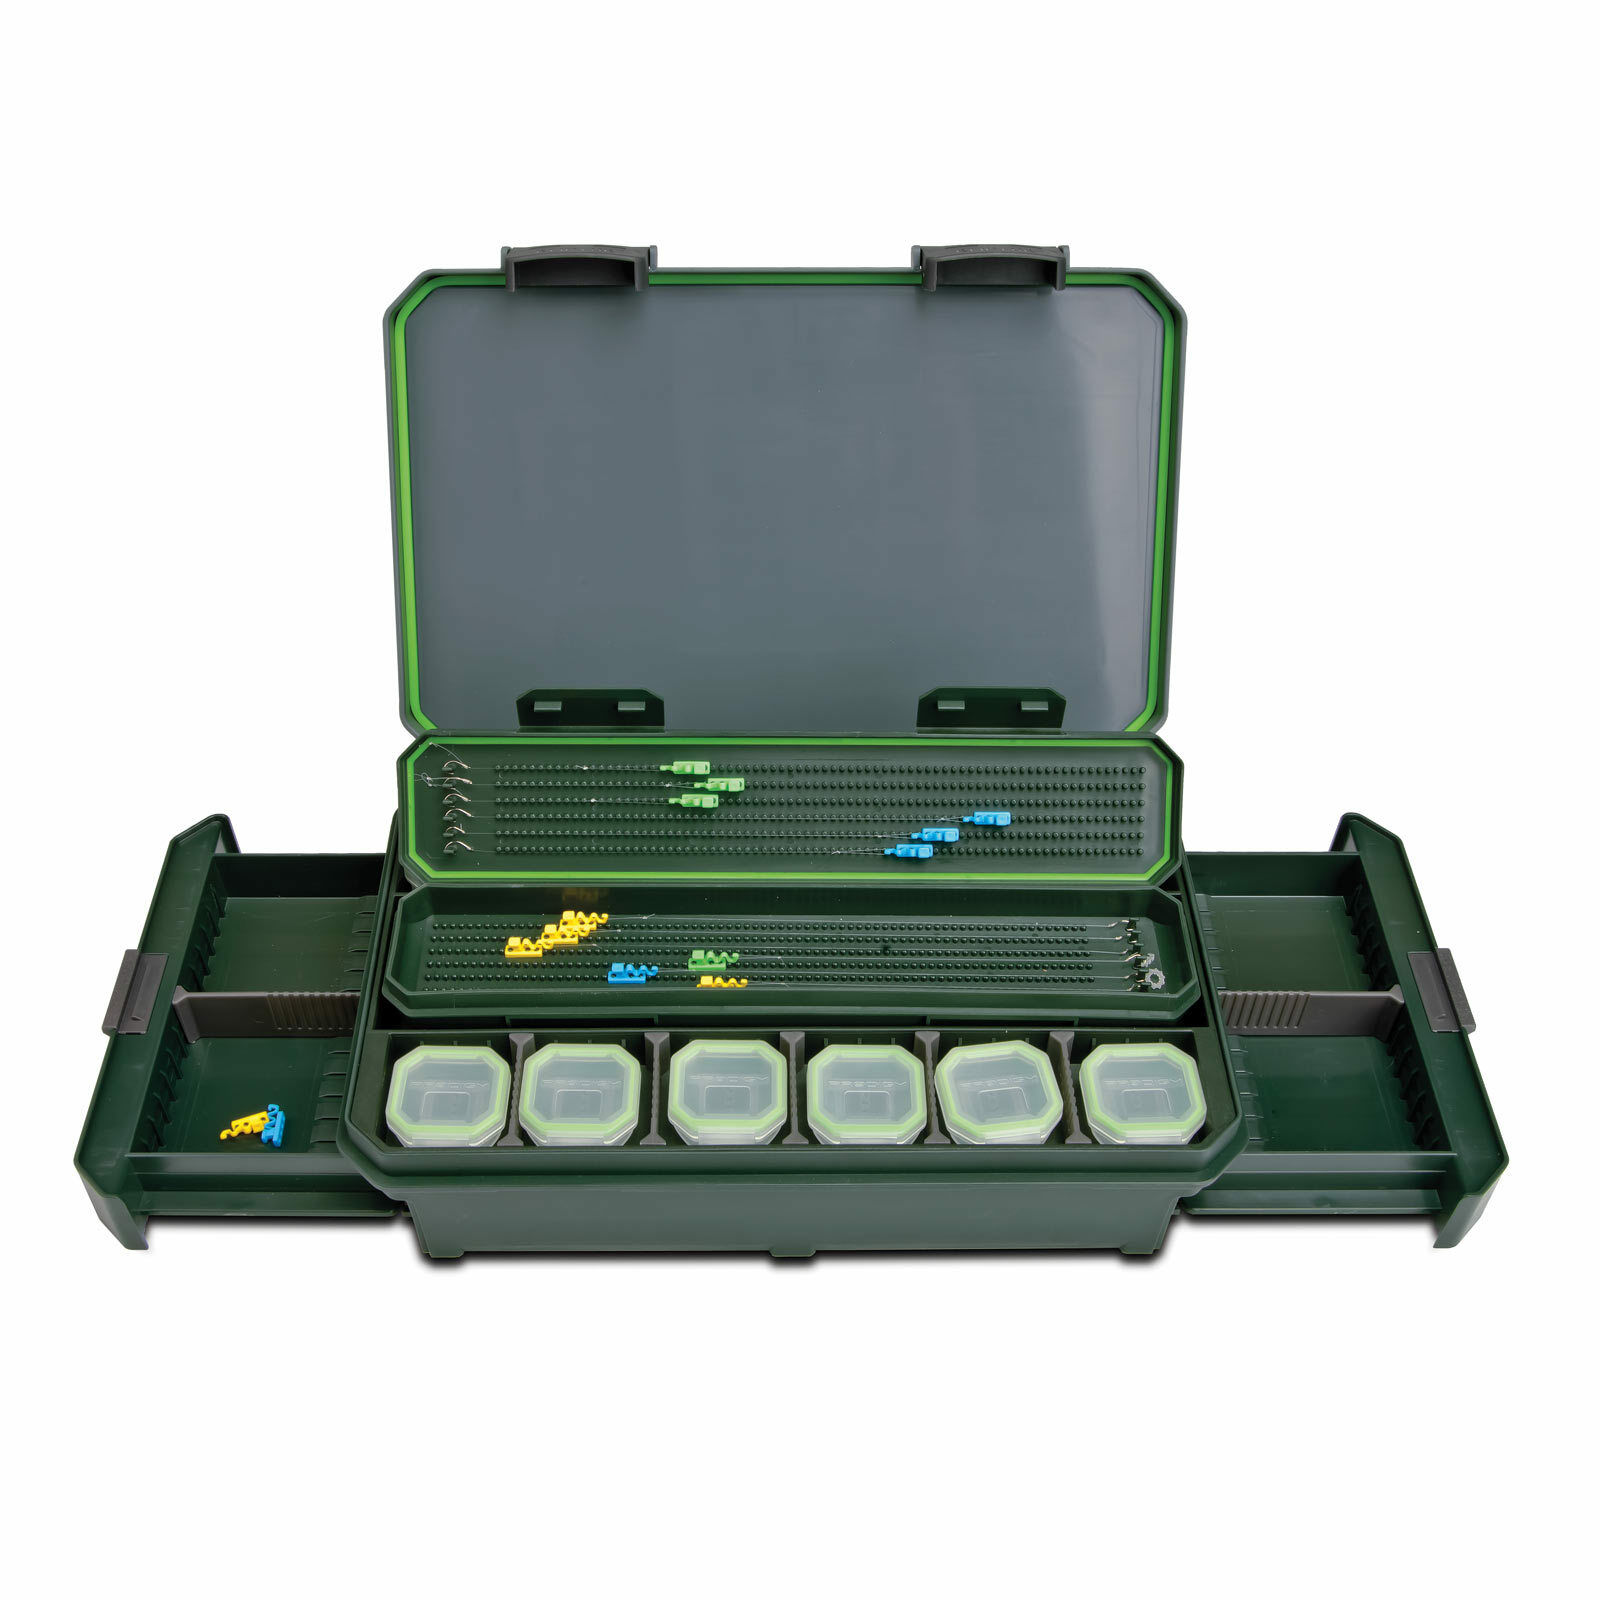 graus Angelbox - Prodigy Tacklebase Compact 32x20x7 cm